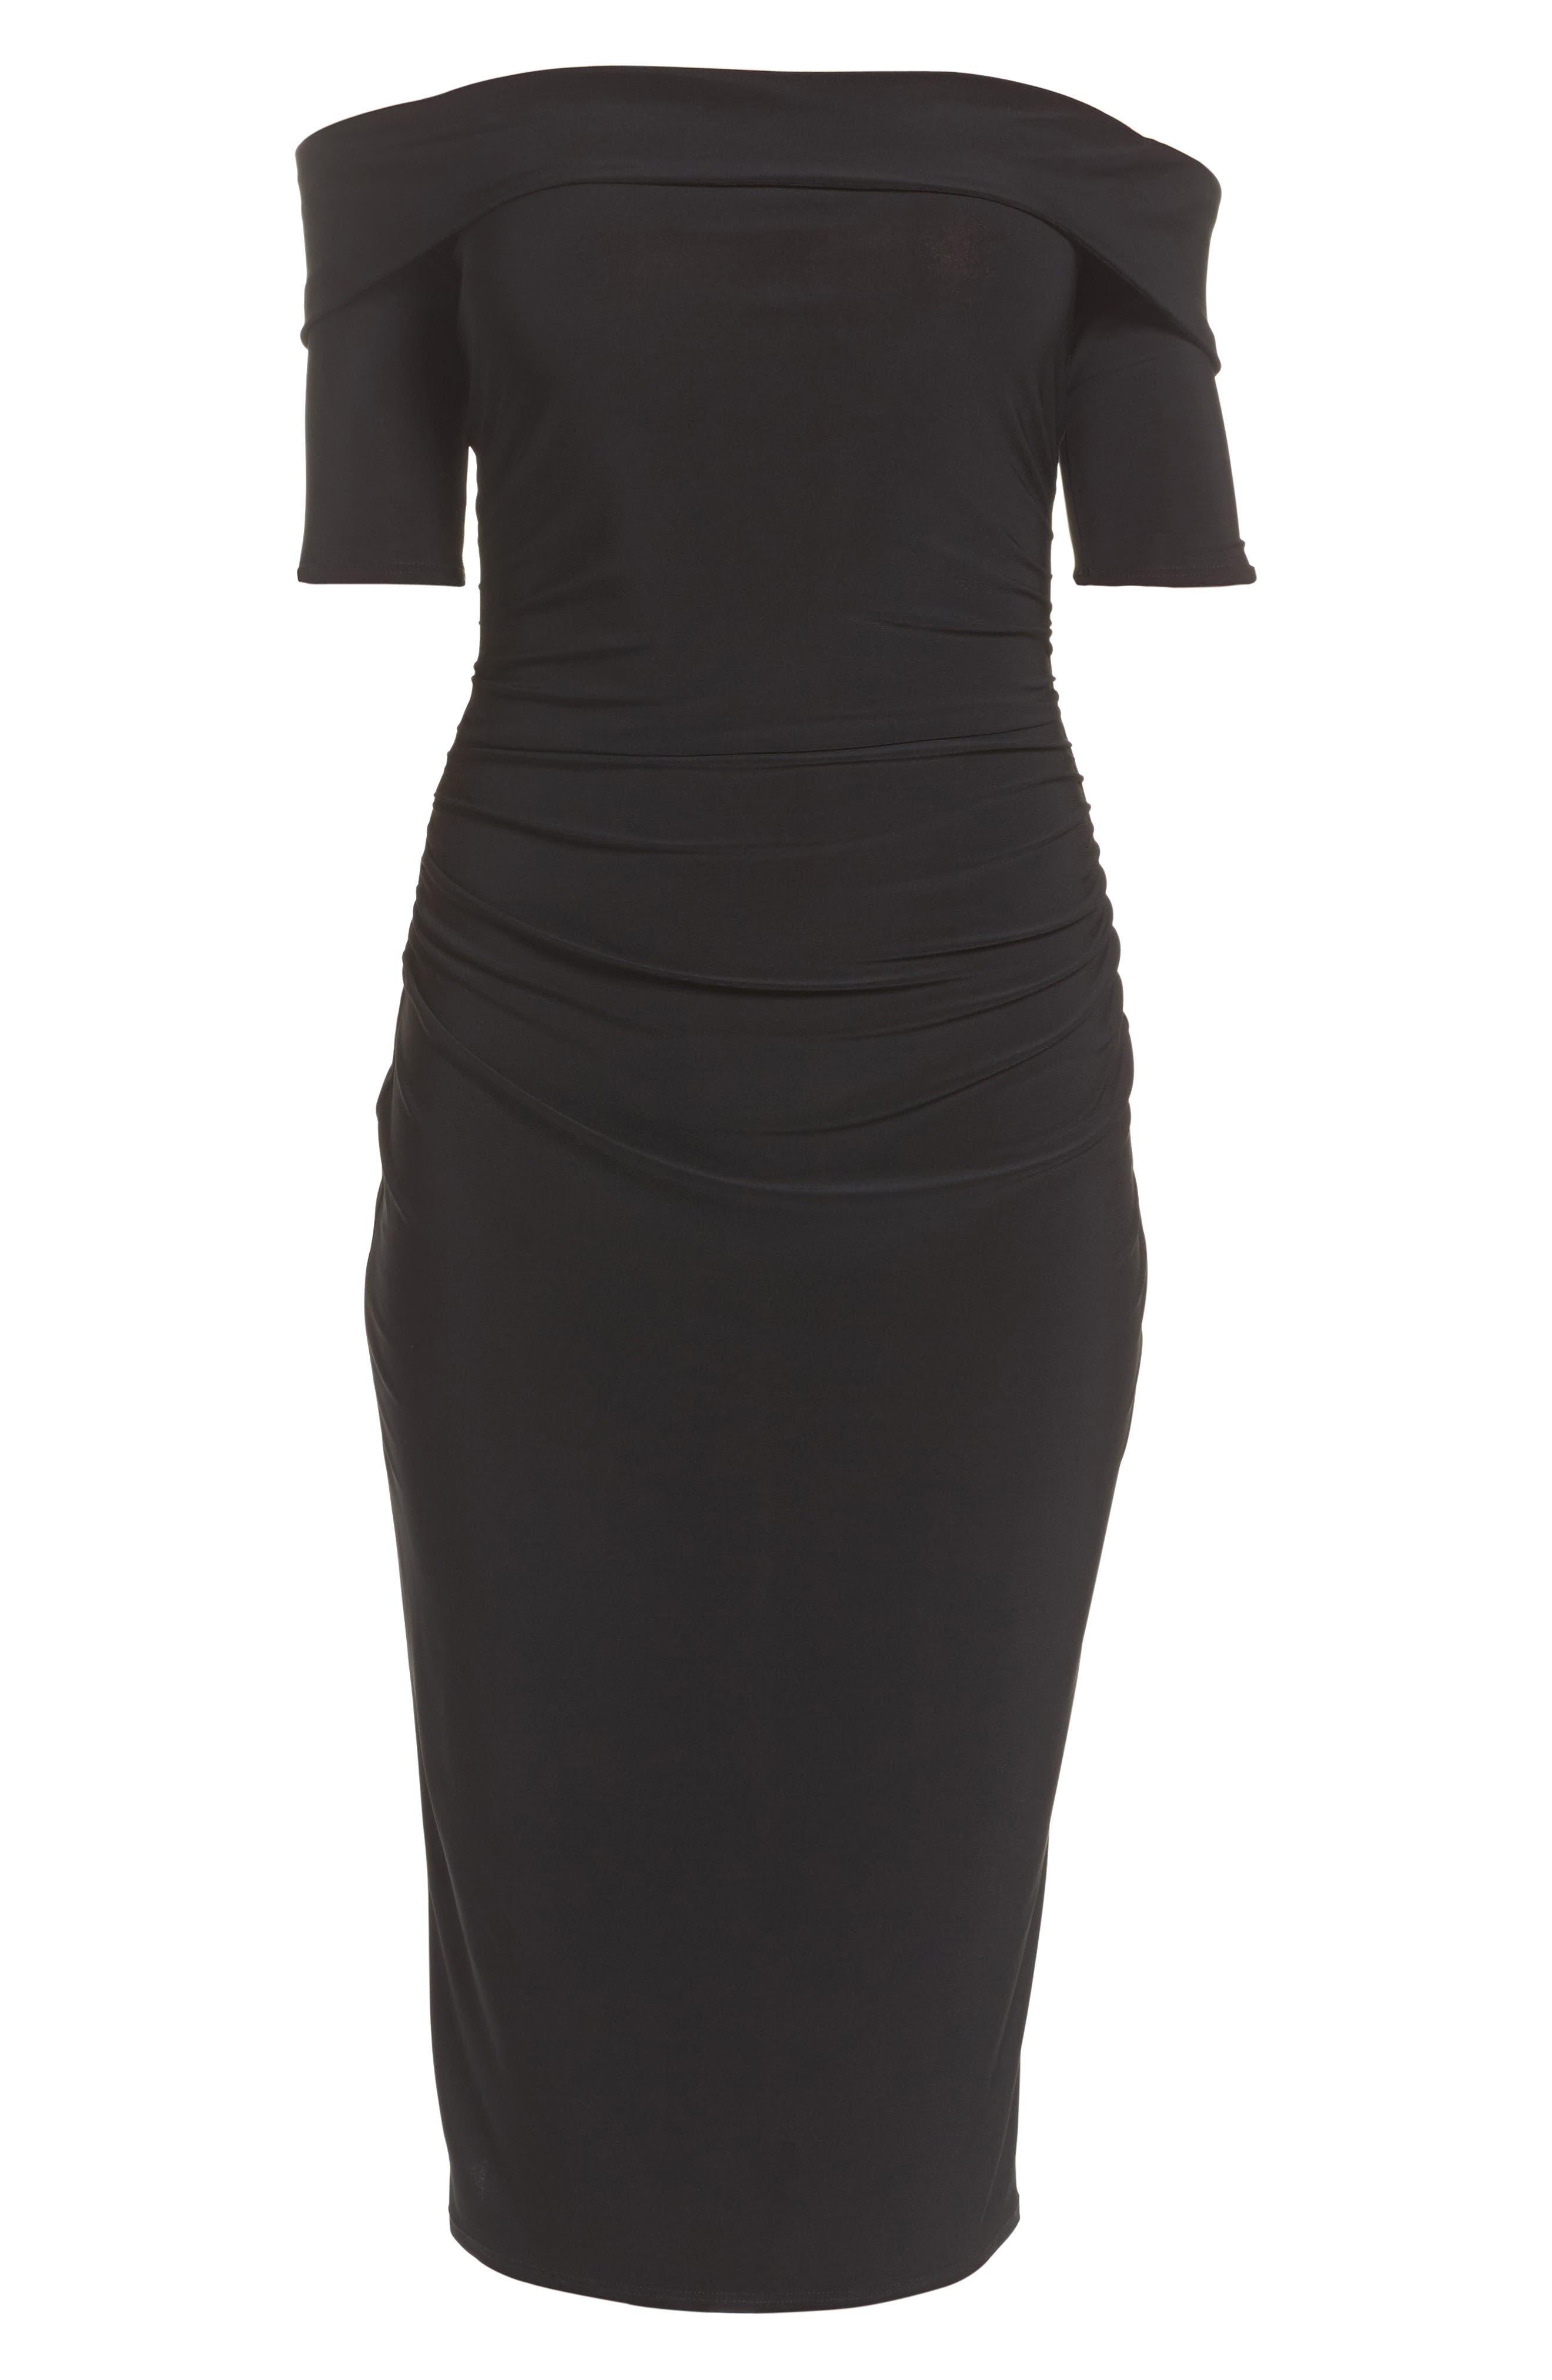 Jacey Off the Shoulder Sheath Dress,                             Alternate thumbnail 6, color,                             Black